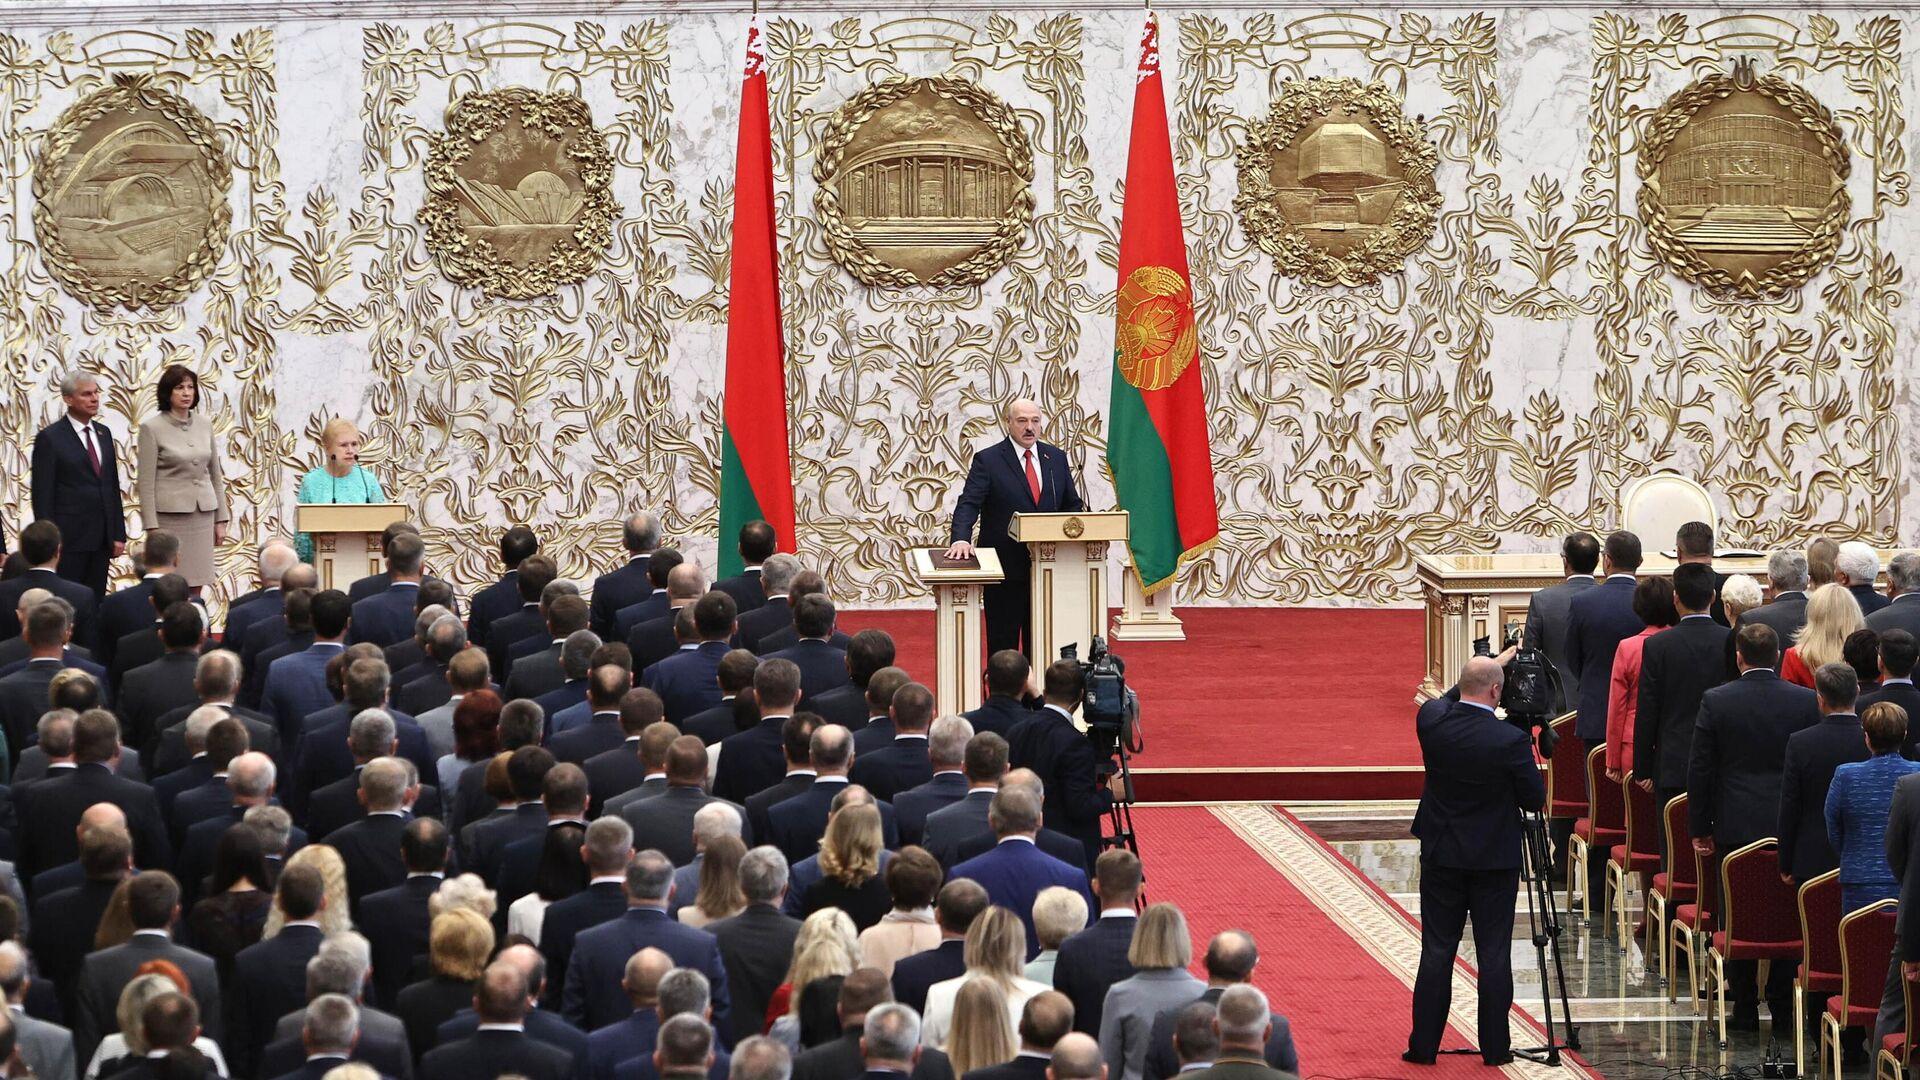 Президент Белоруссии Александр Лукашенко на церемонии инаугурации в Минске - РИА Новости, 1920, 23.09.2020